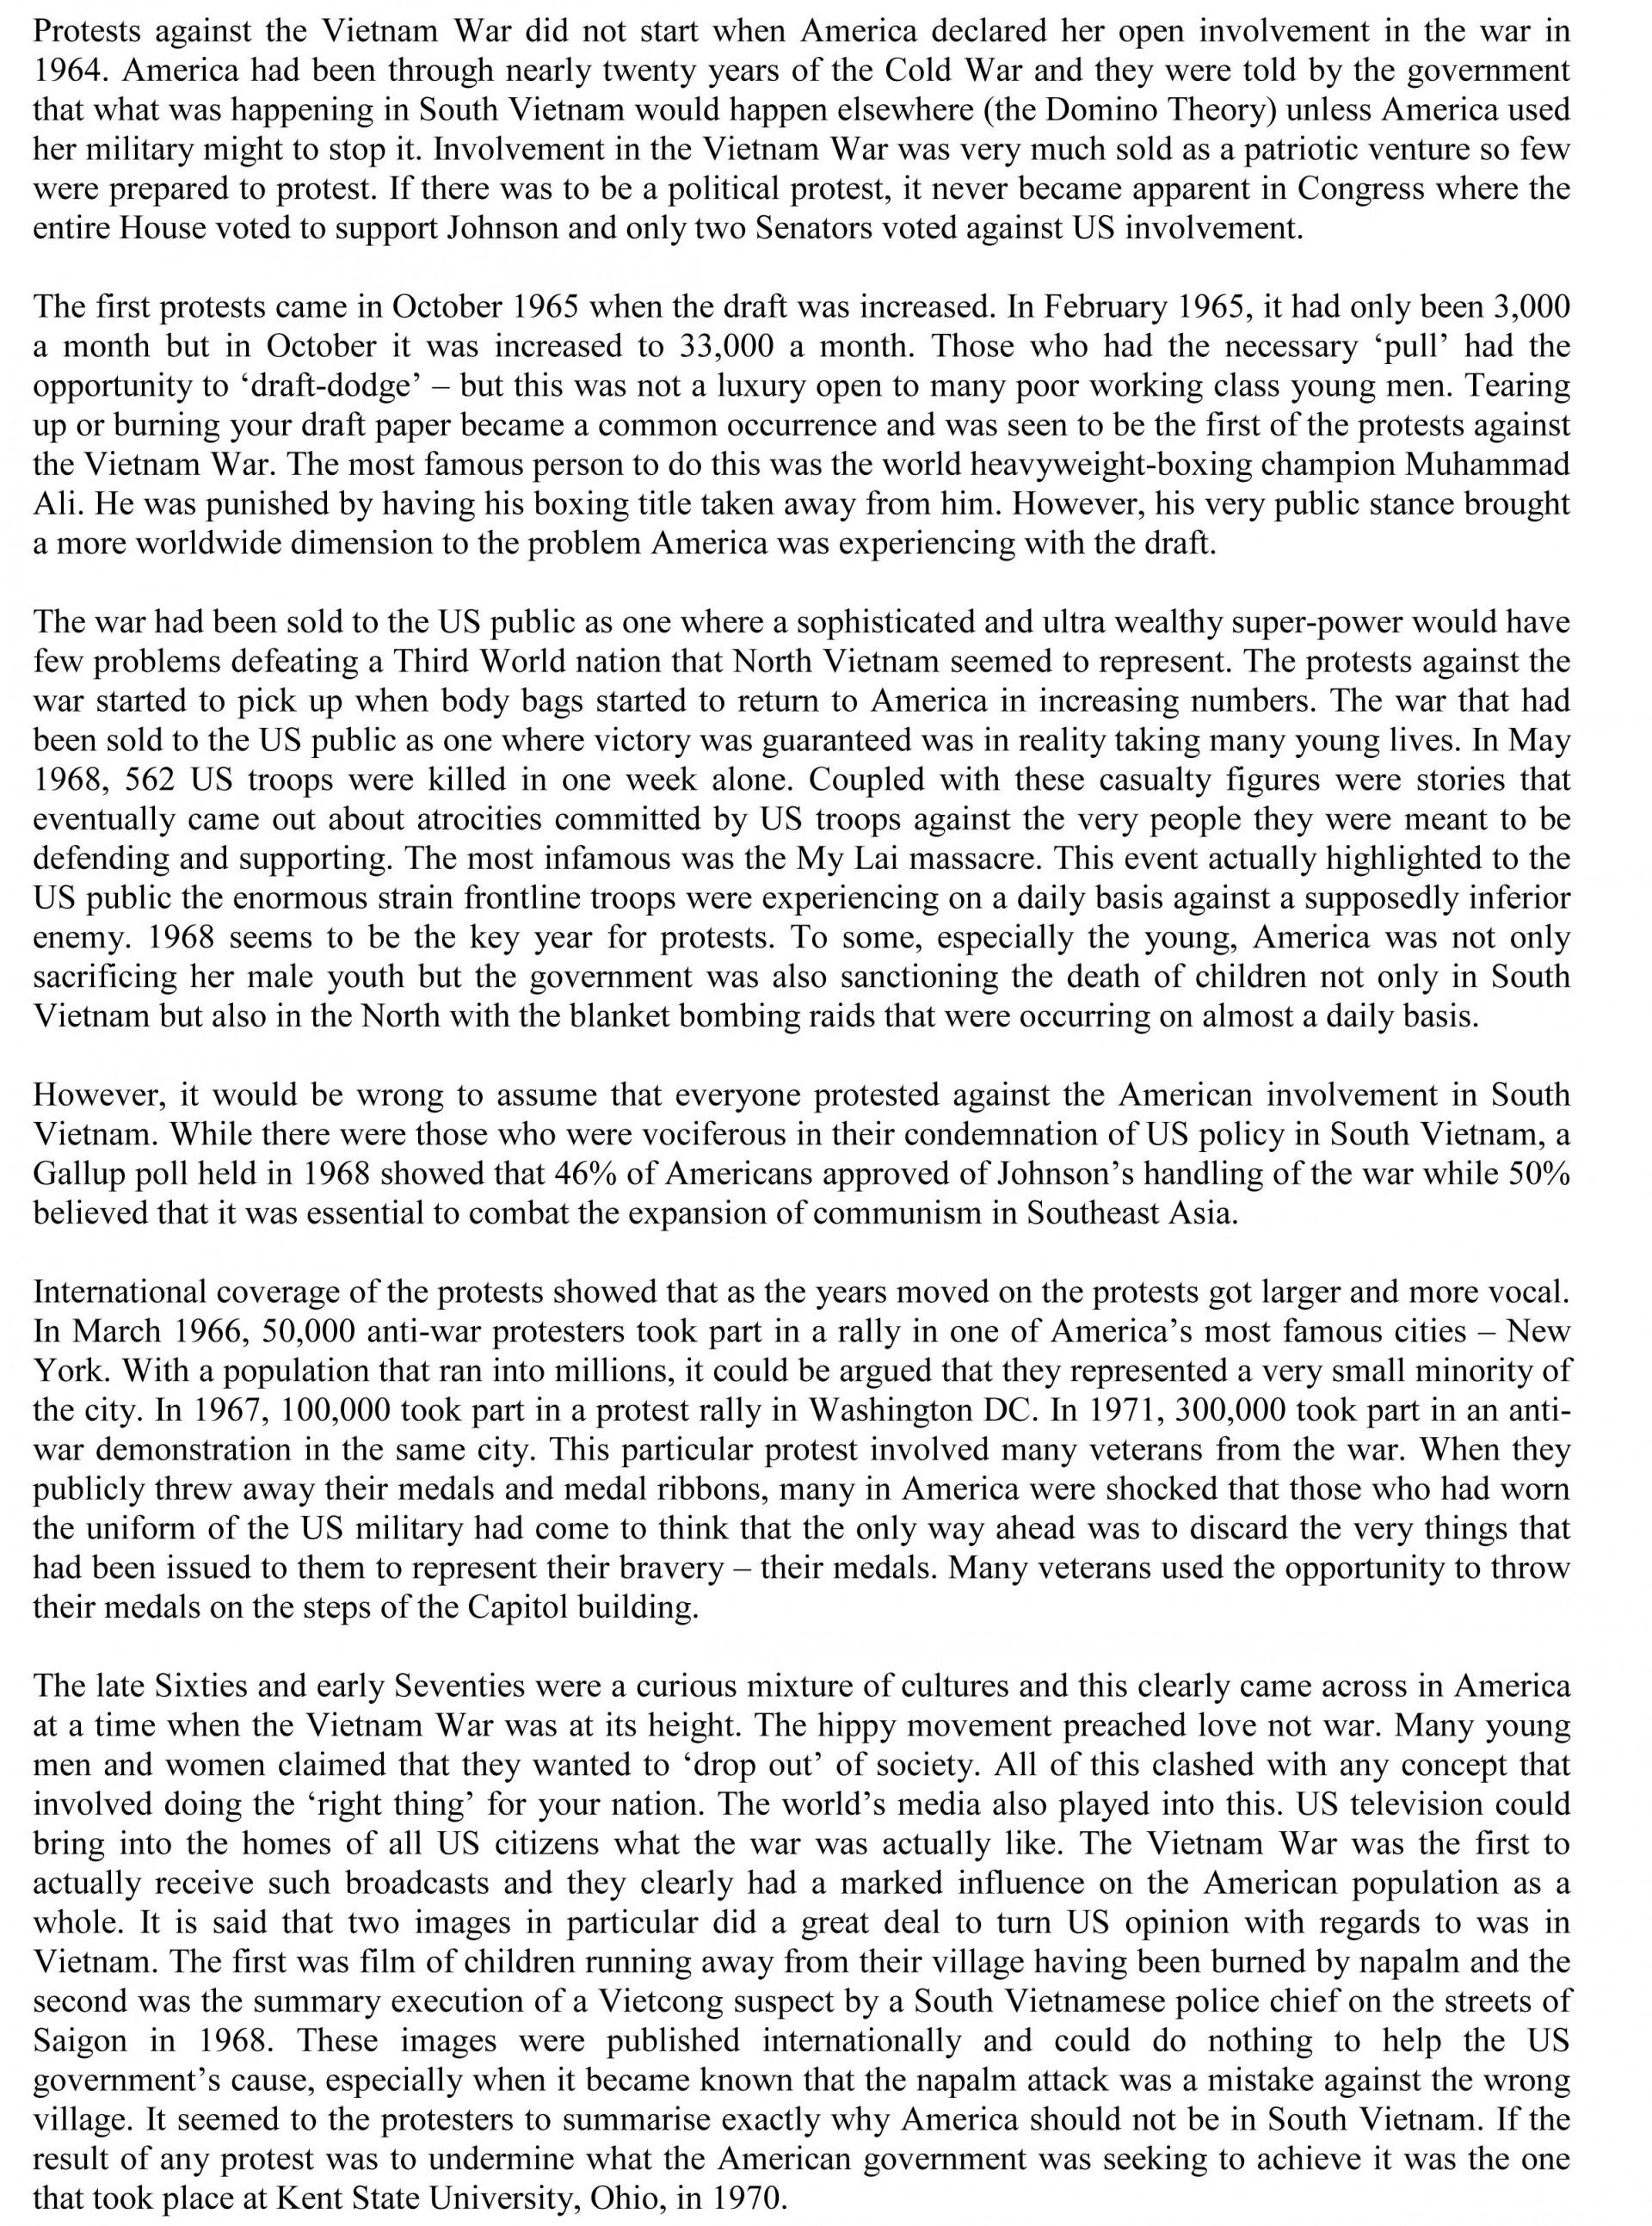 005 Essay Example Vietnam War Beautiful Satire Examples On Gun Control Questions Ideas 1920